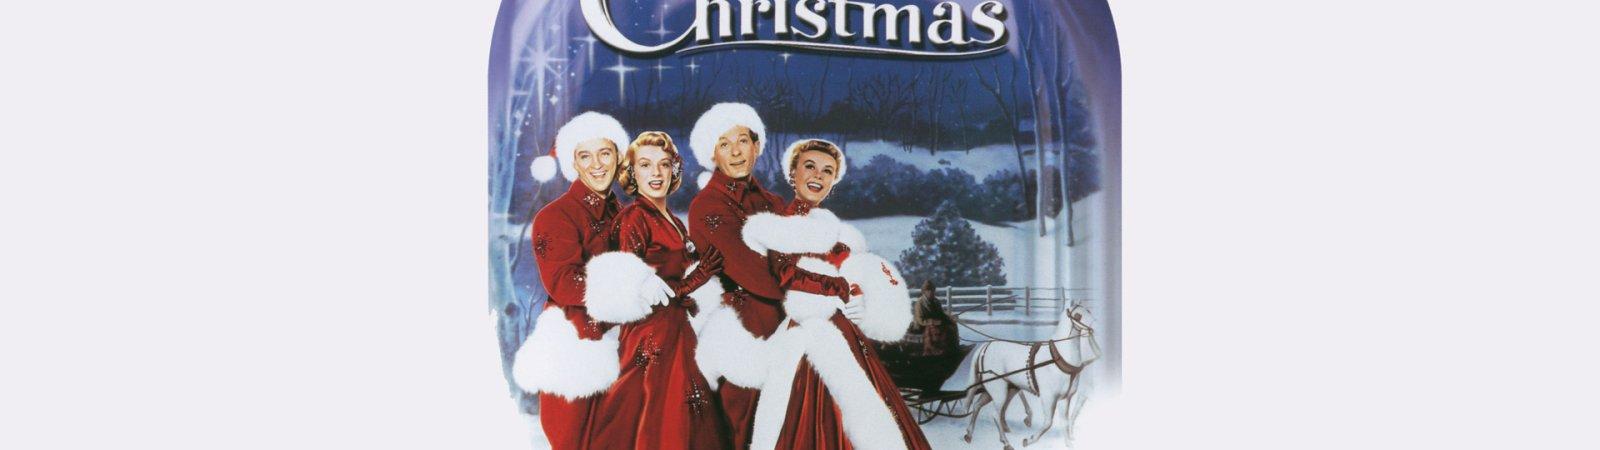 Photo dernier film Bing Crosby